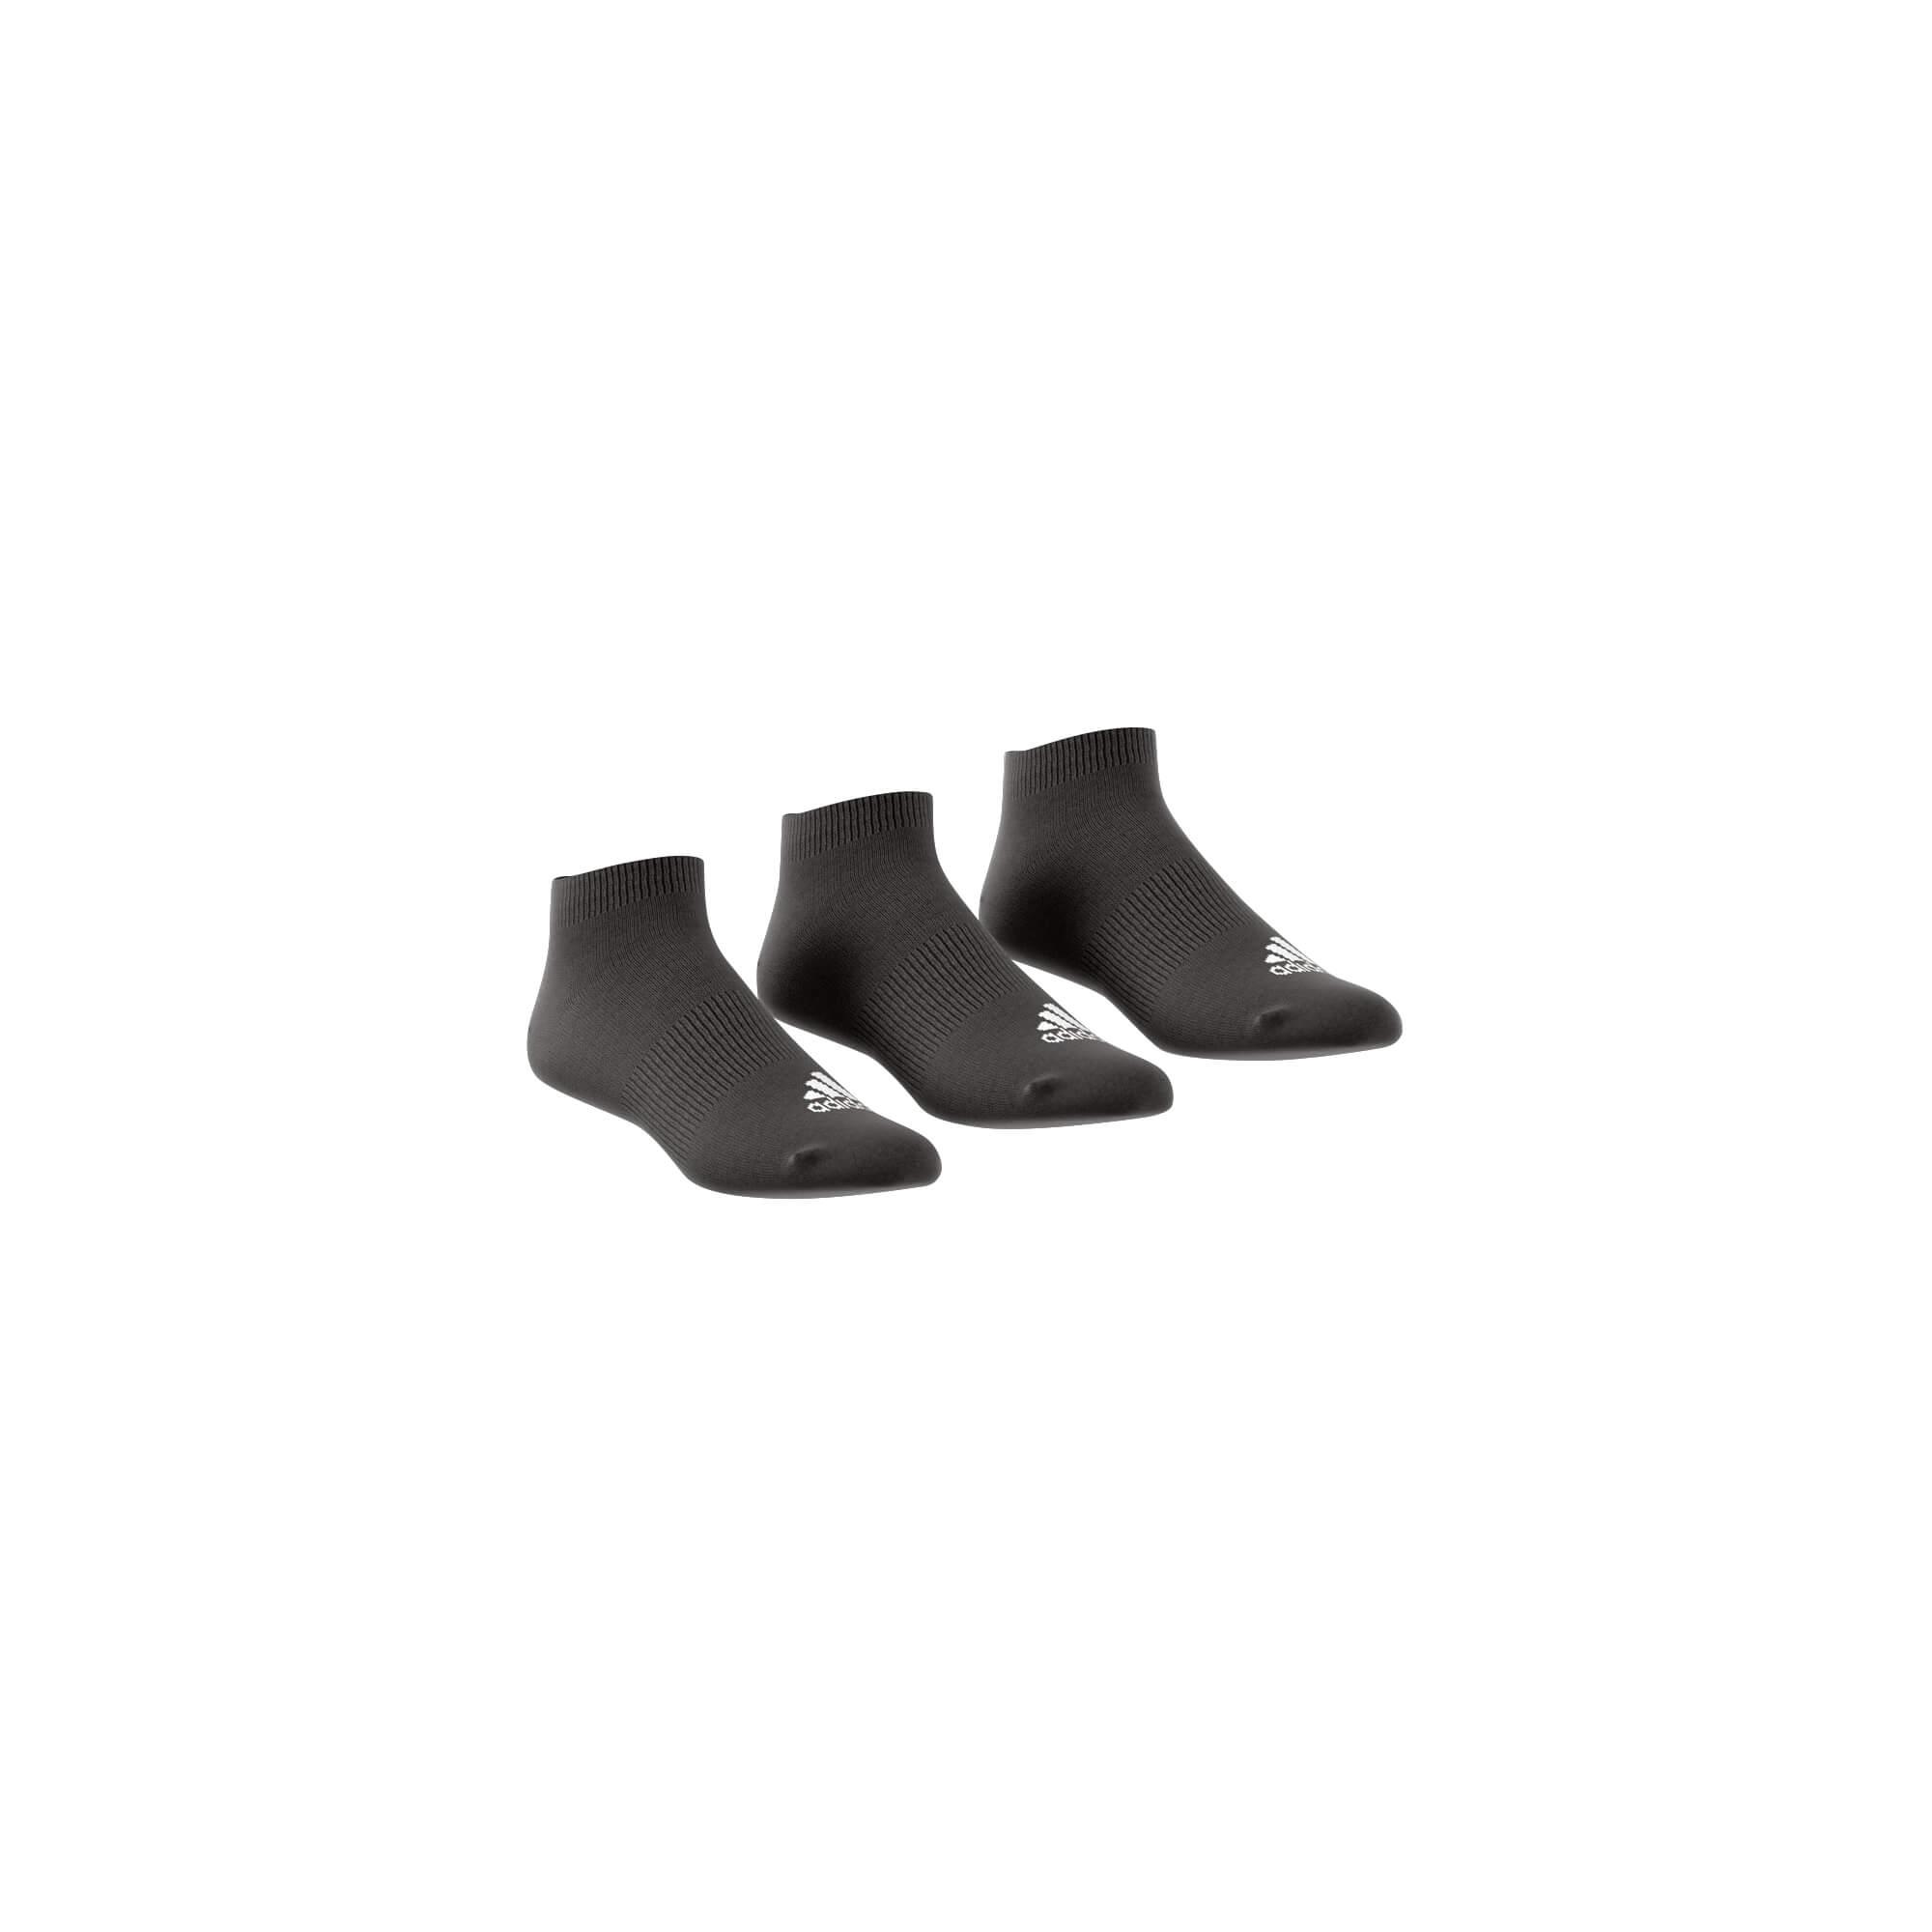 TCorpLiner 3pp adidas